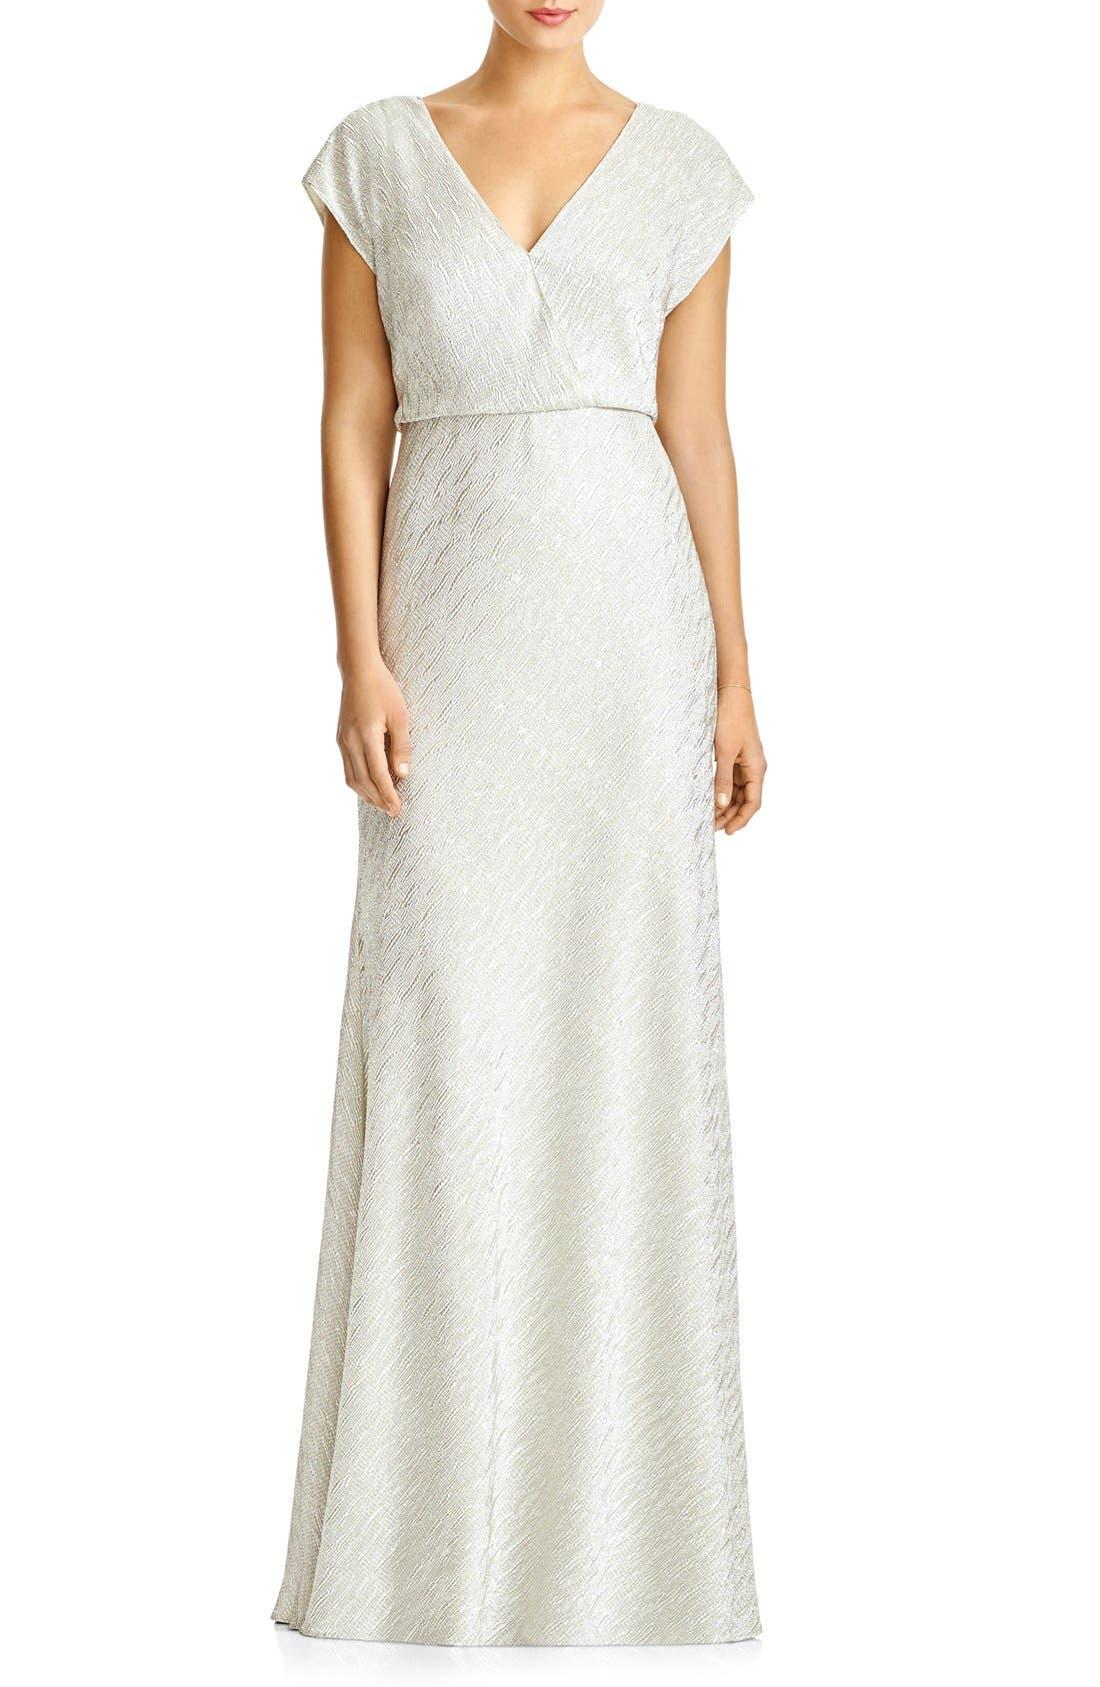 JY JENNY YOO 'Soho' Metallic Blouson V-Neck Gown